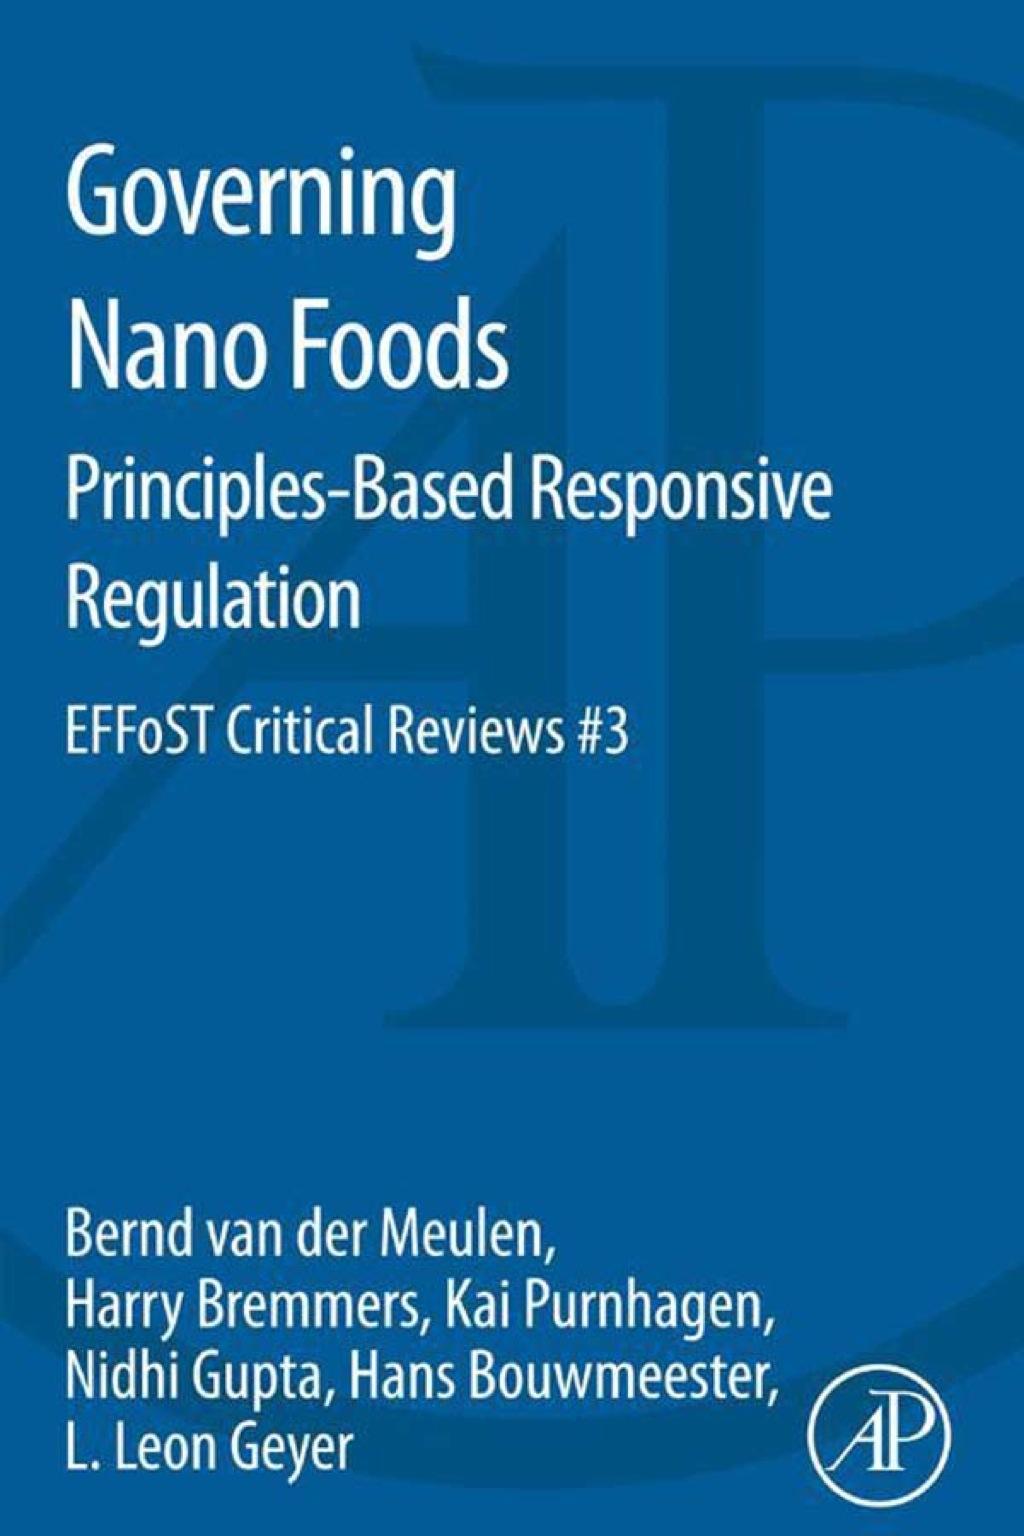 By Meulen,  Bernd van der; Bremmers,  Harry; Purnhagen,  Kai; Gupta,  Nidhi; Bouwmeester,  Hans; Geyer,  L